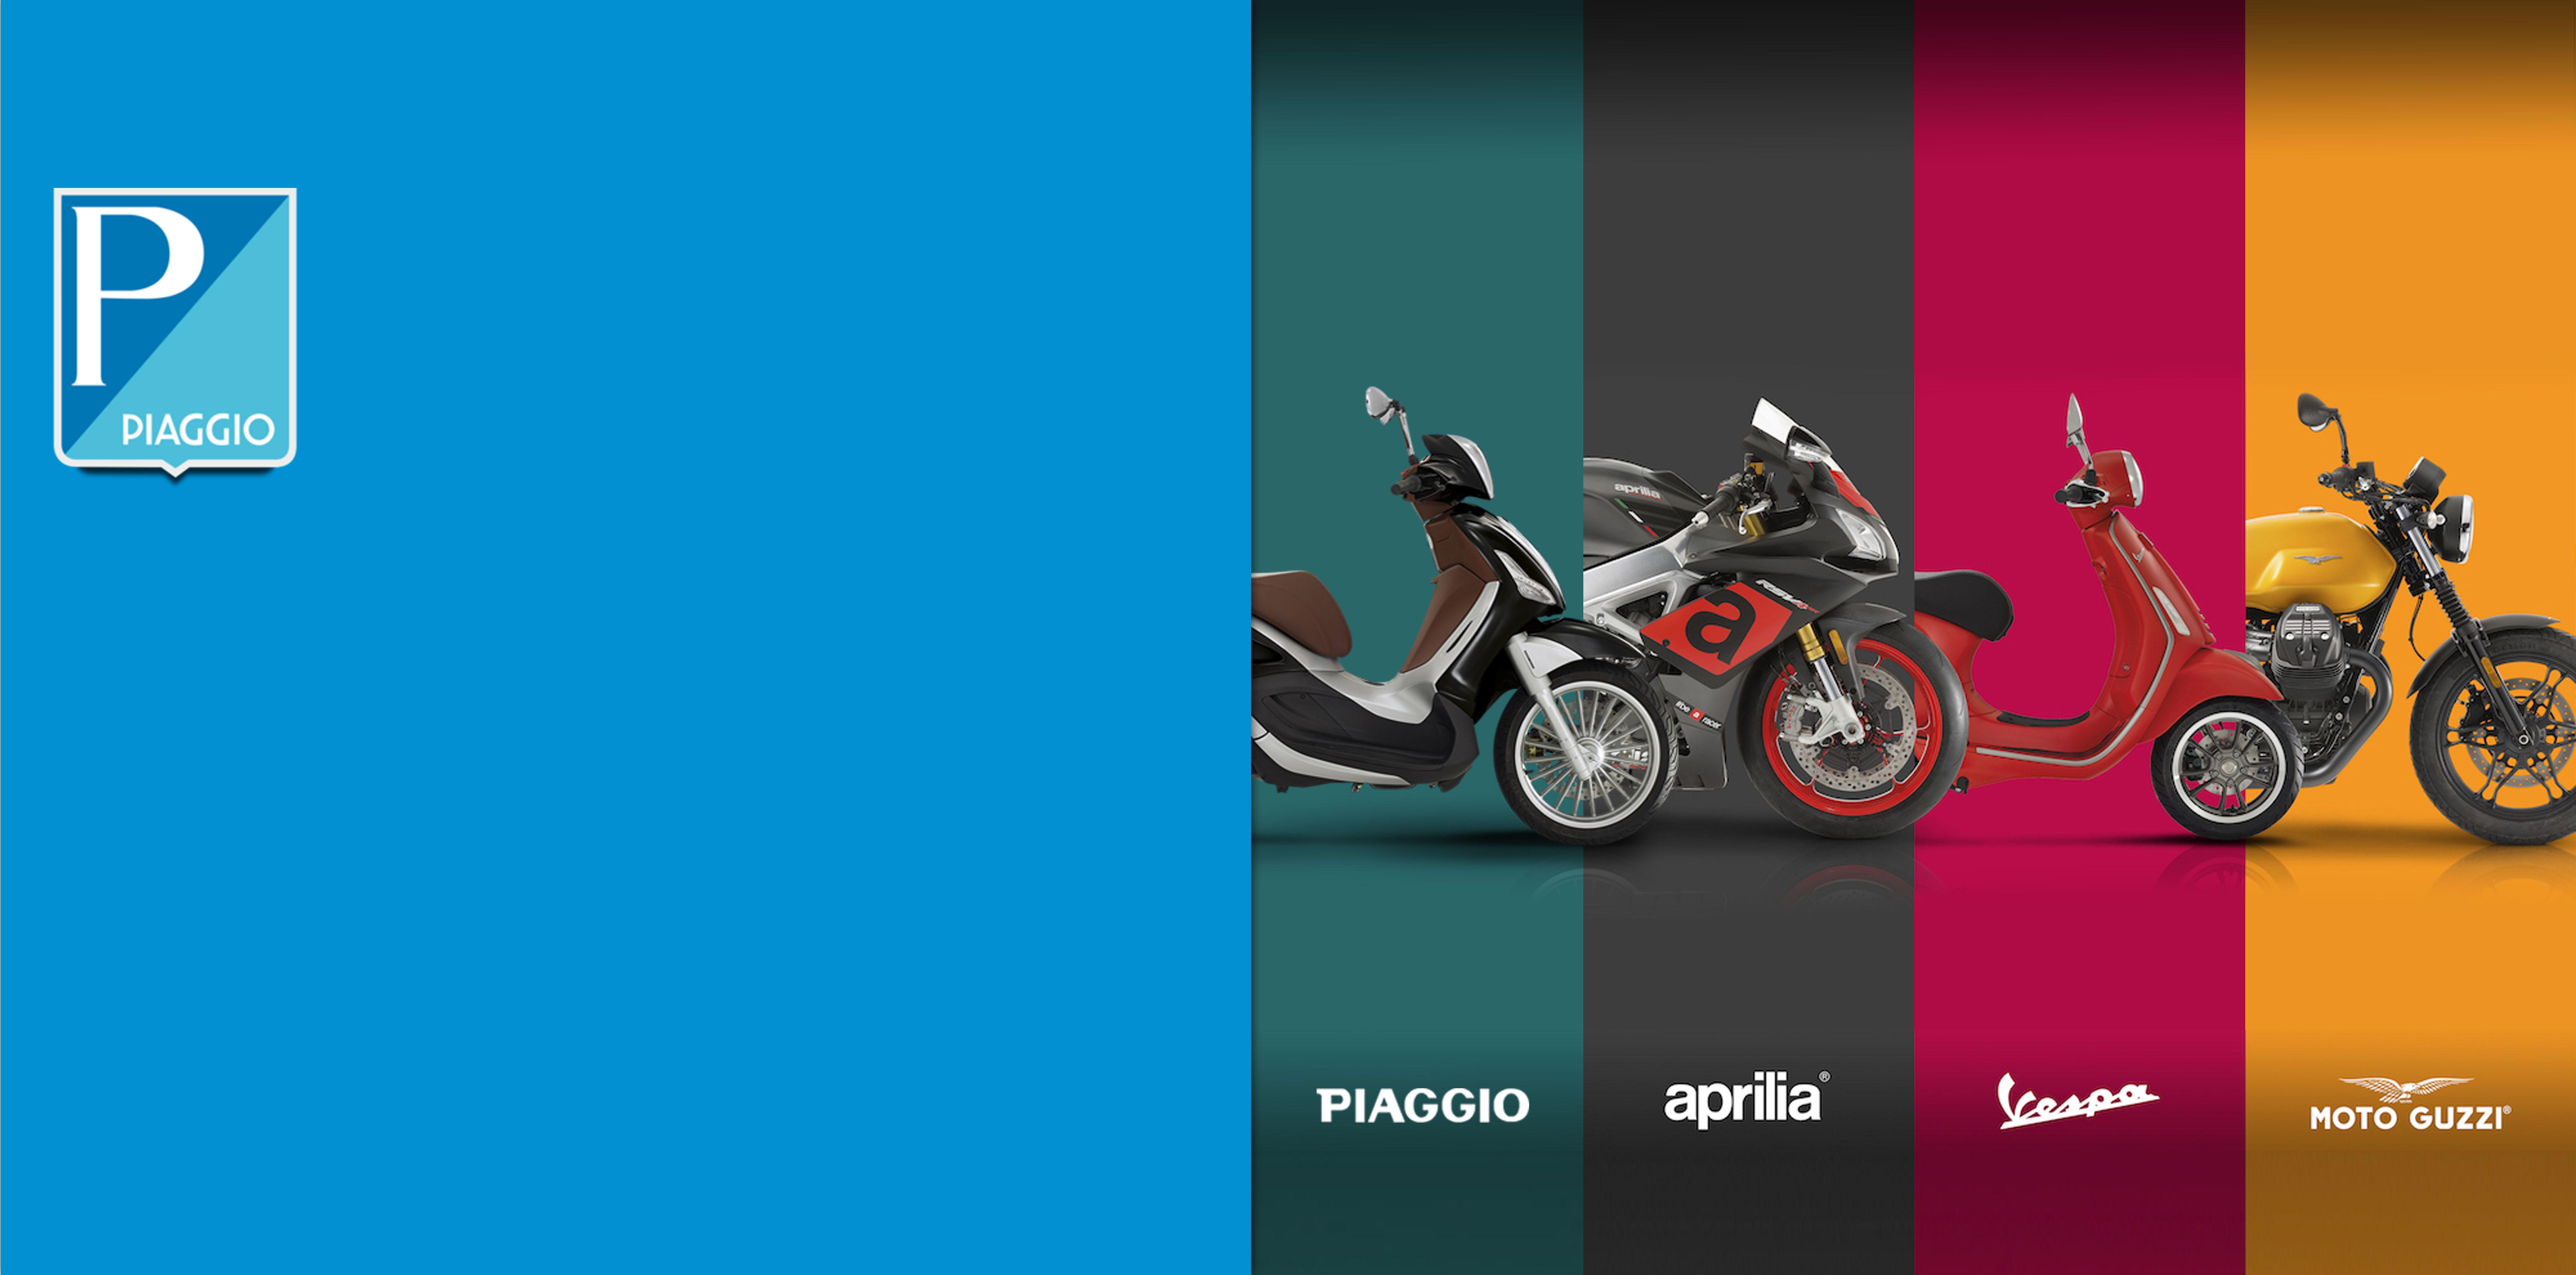 piaggio-group-motoplanet-slide-1